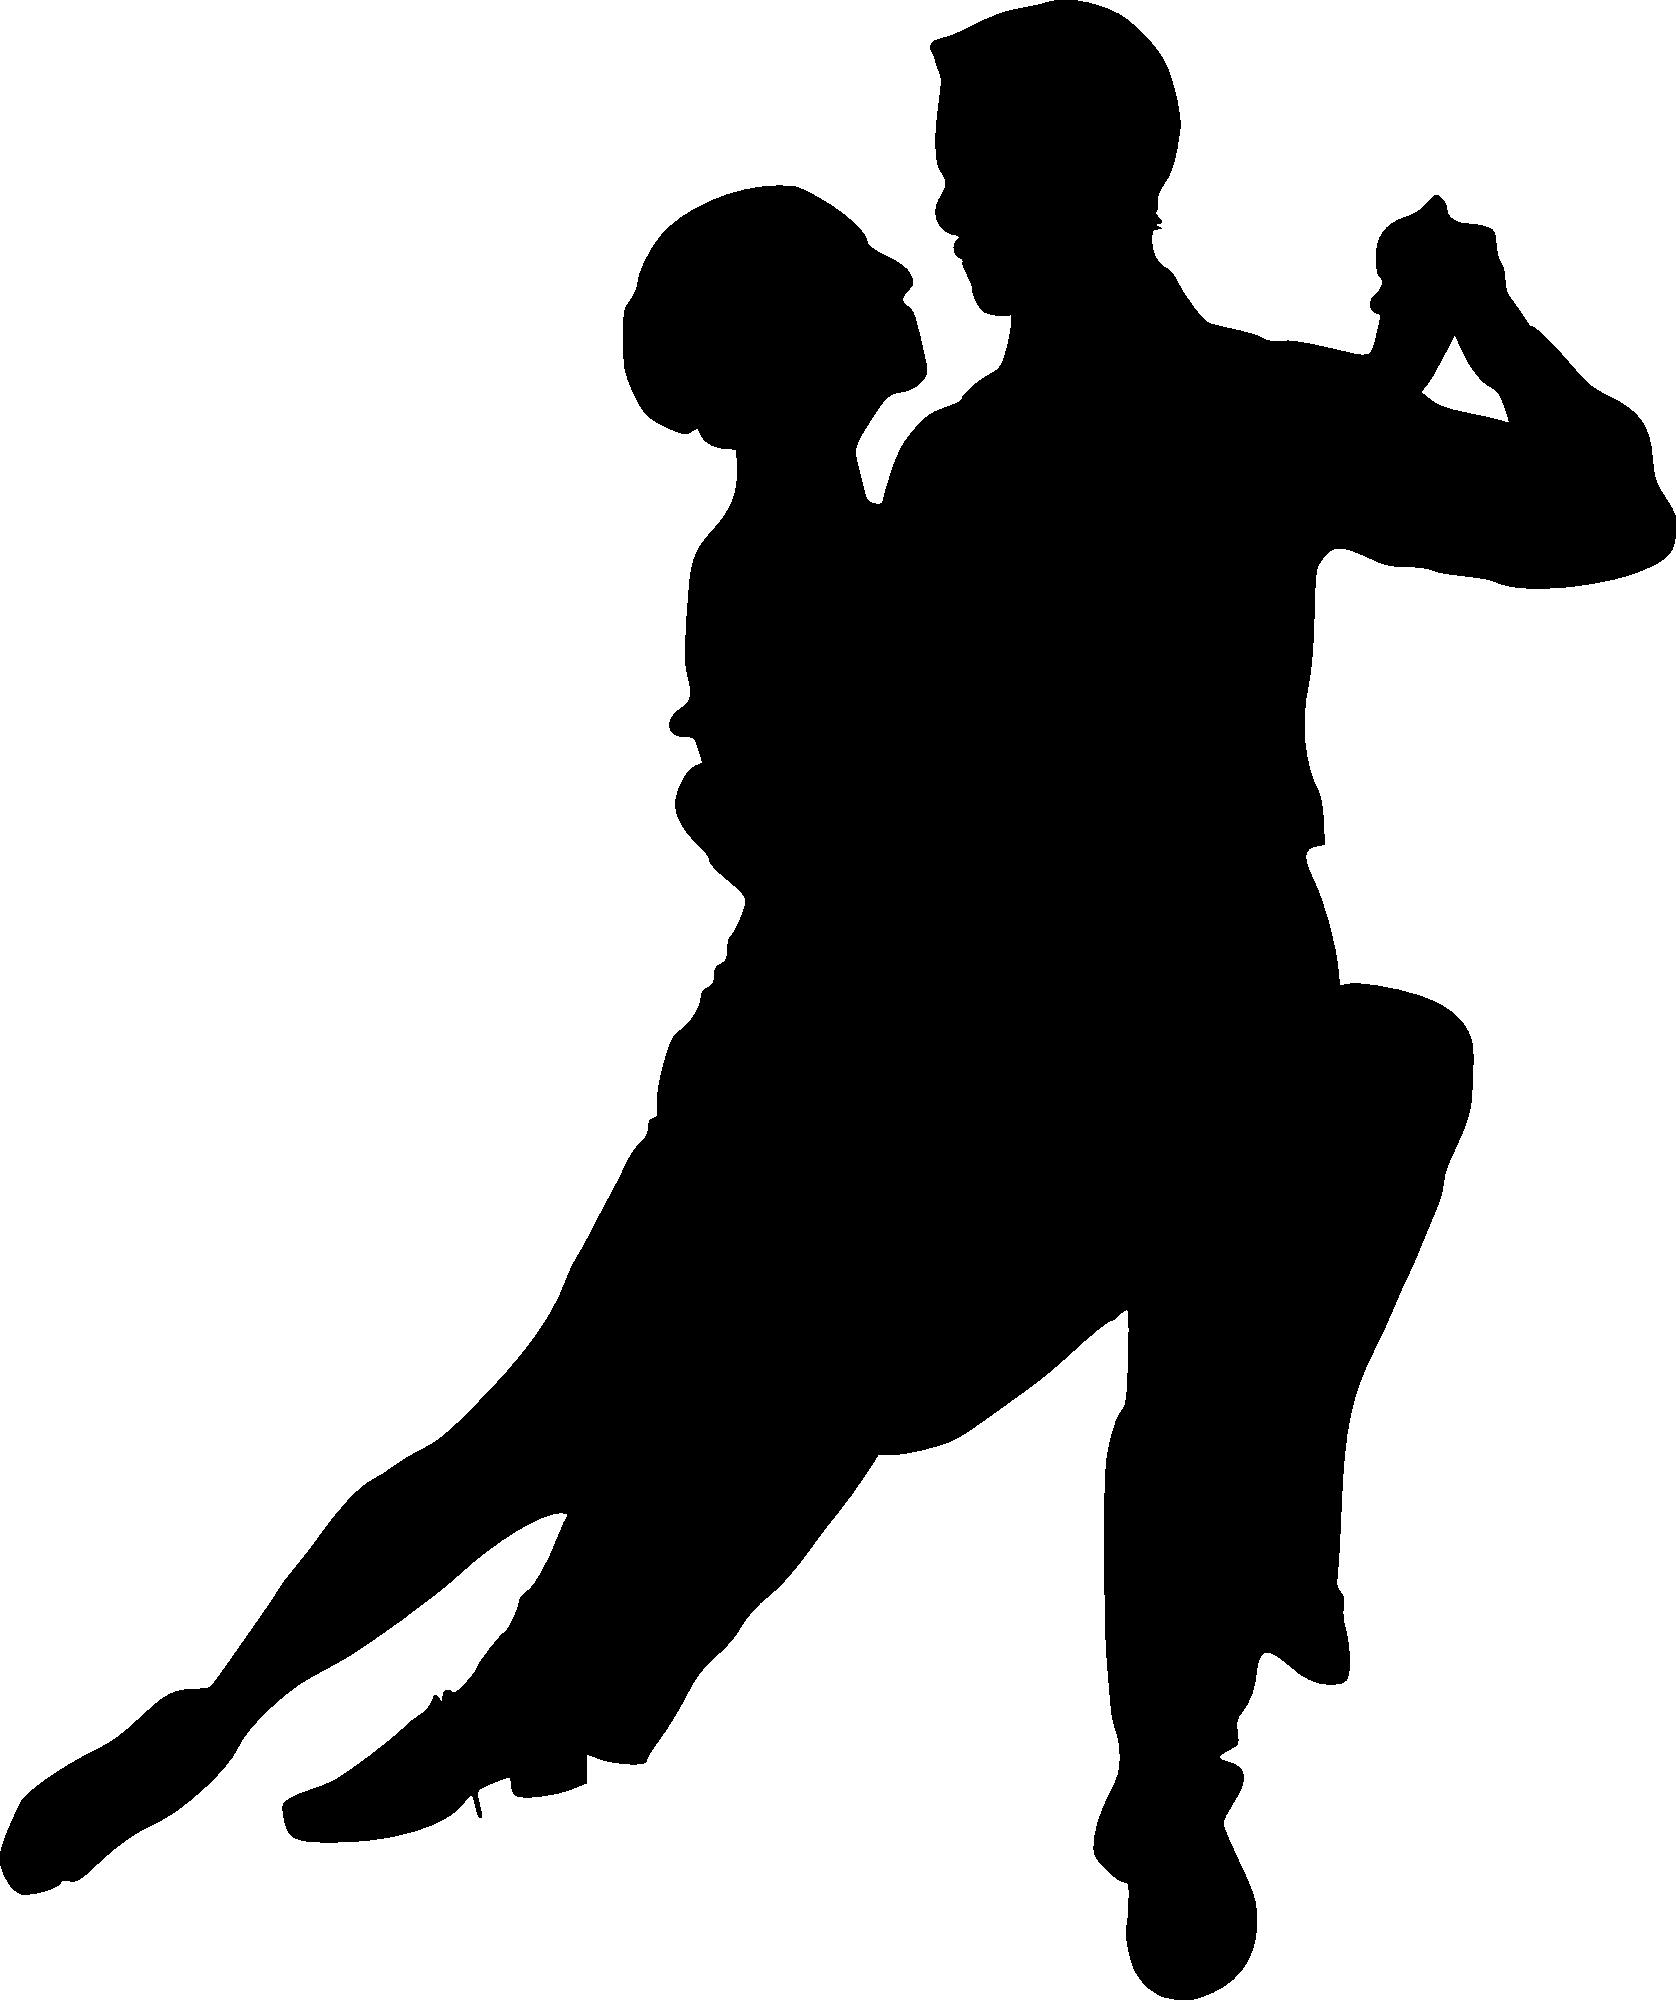 Dancer Silhouette Transparent Background